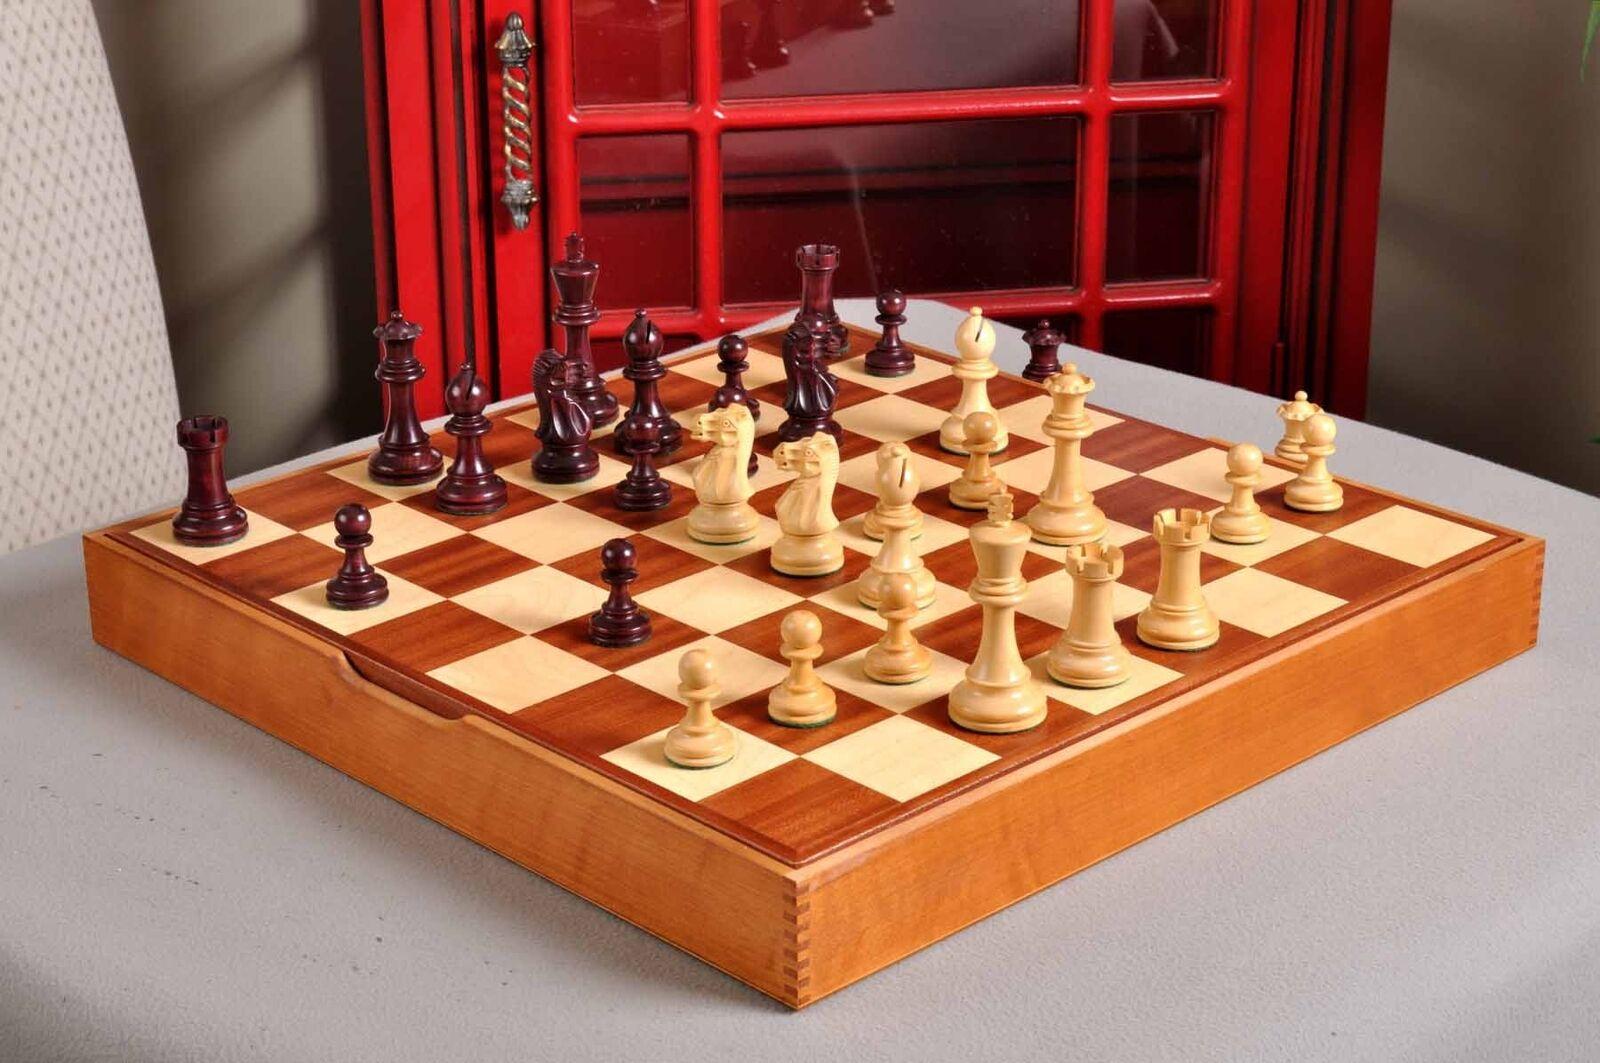 The Grandmaster Chess Set and Casket Combination - 4.0  King - violaheart Gilde